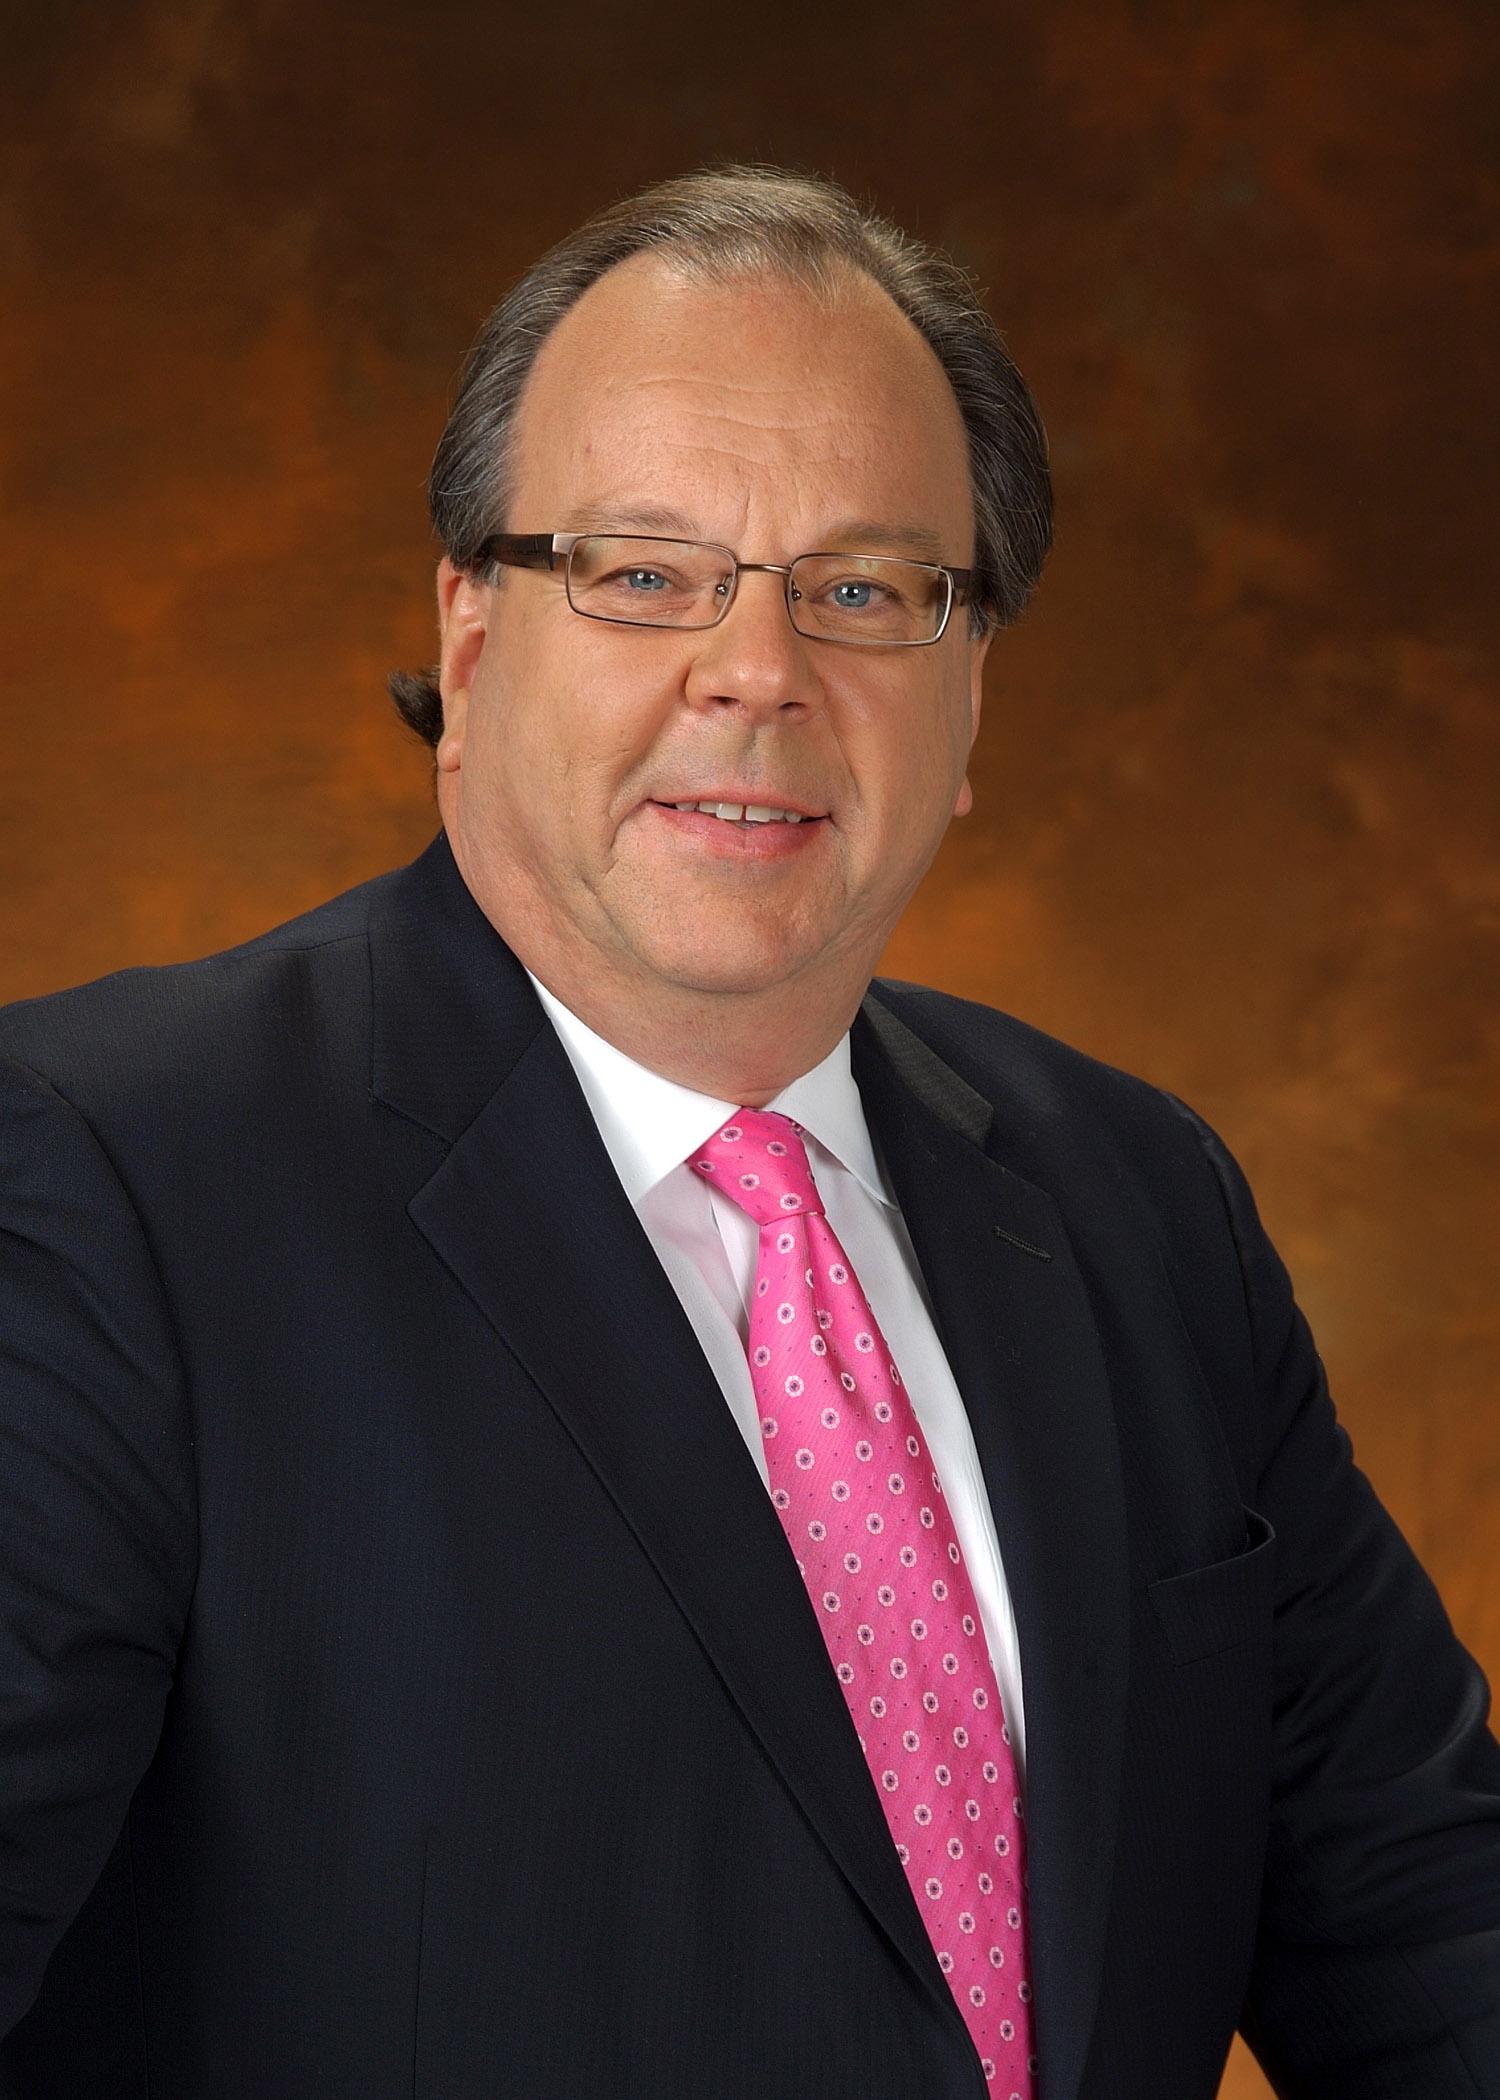 John Koelmel